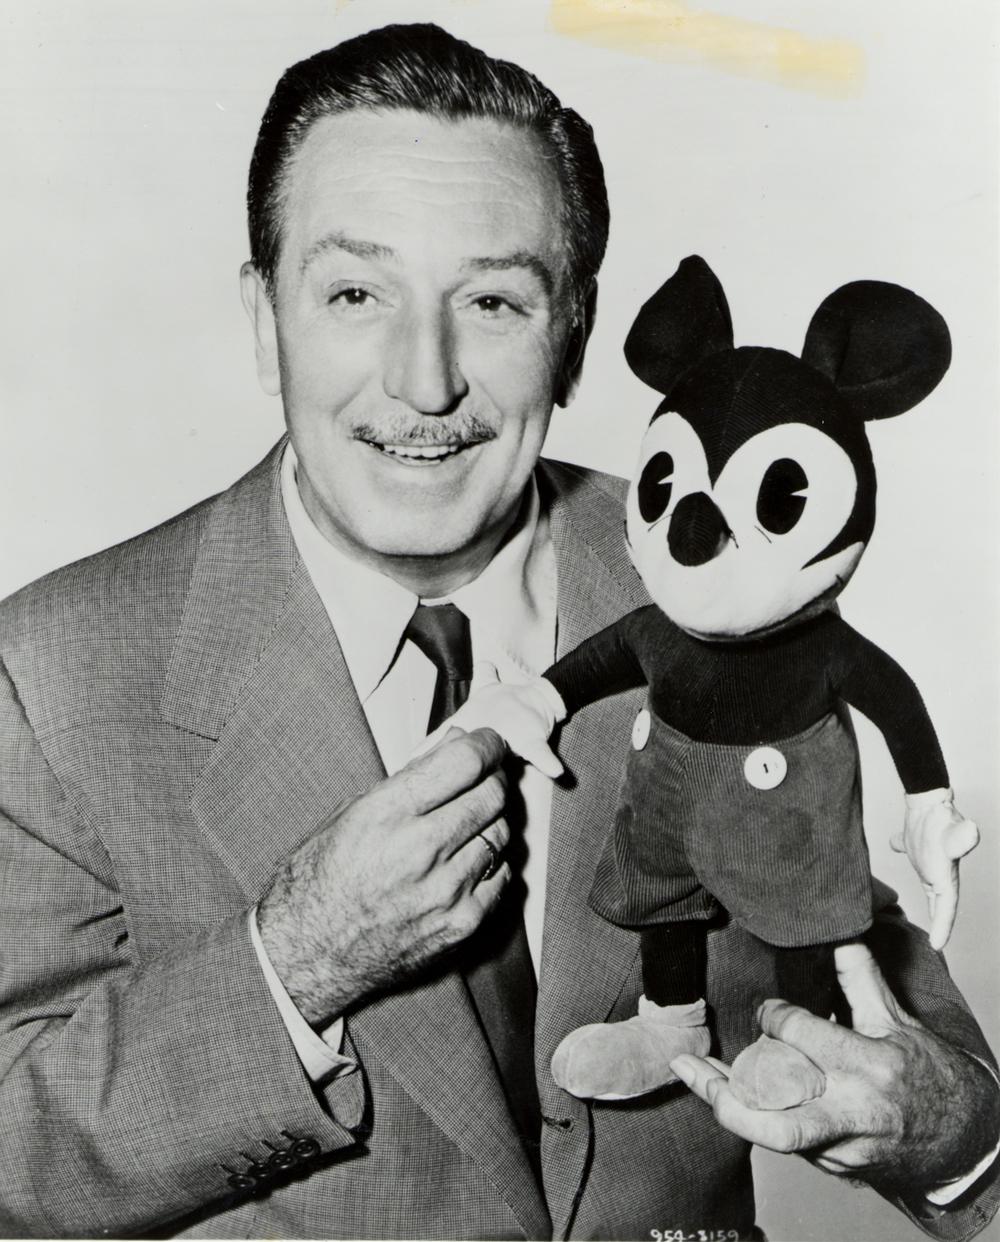 Walt Disney: Not Kanye. Also, not frozen. That's a myth, sorry.